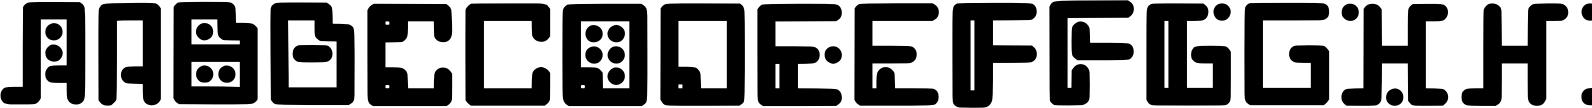 Computerize